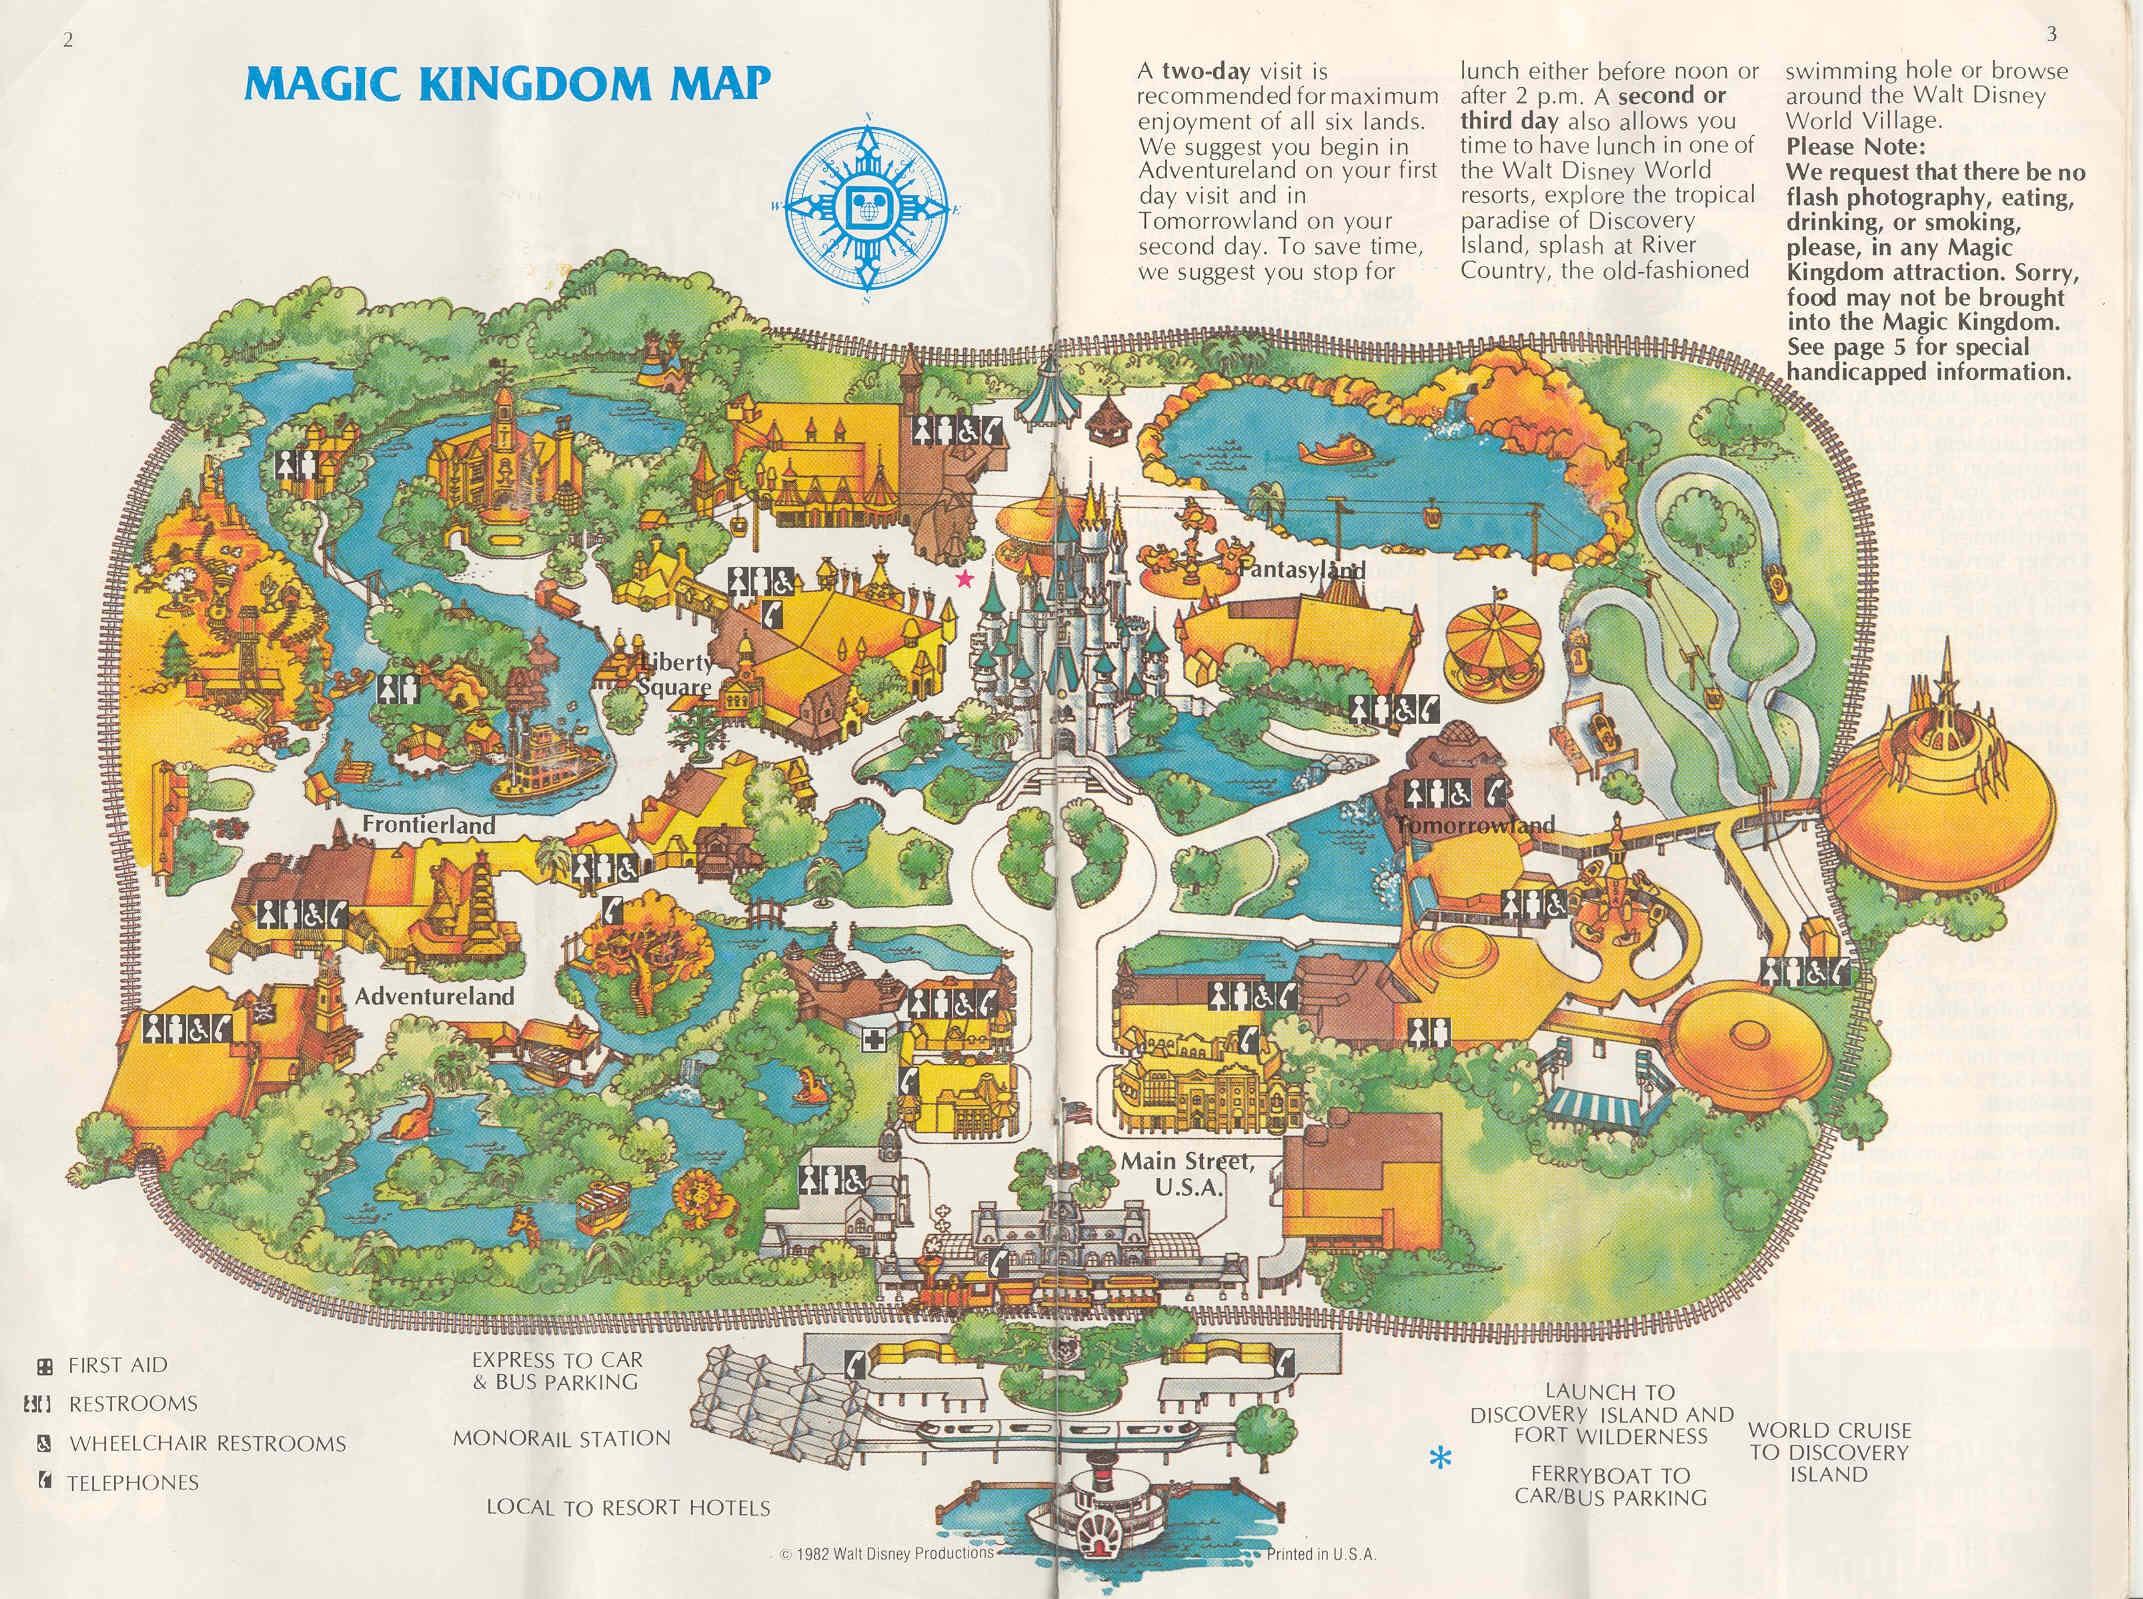 walt-disney-world-magic-kingdom-map-26.jpg